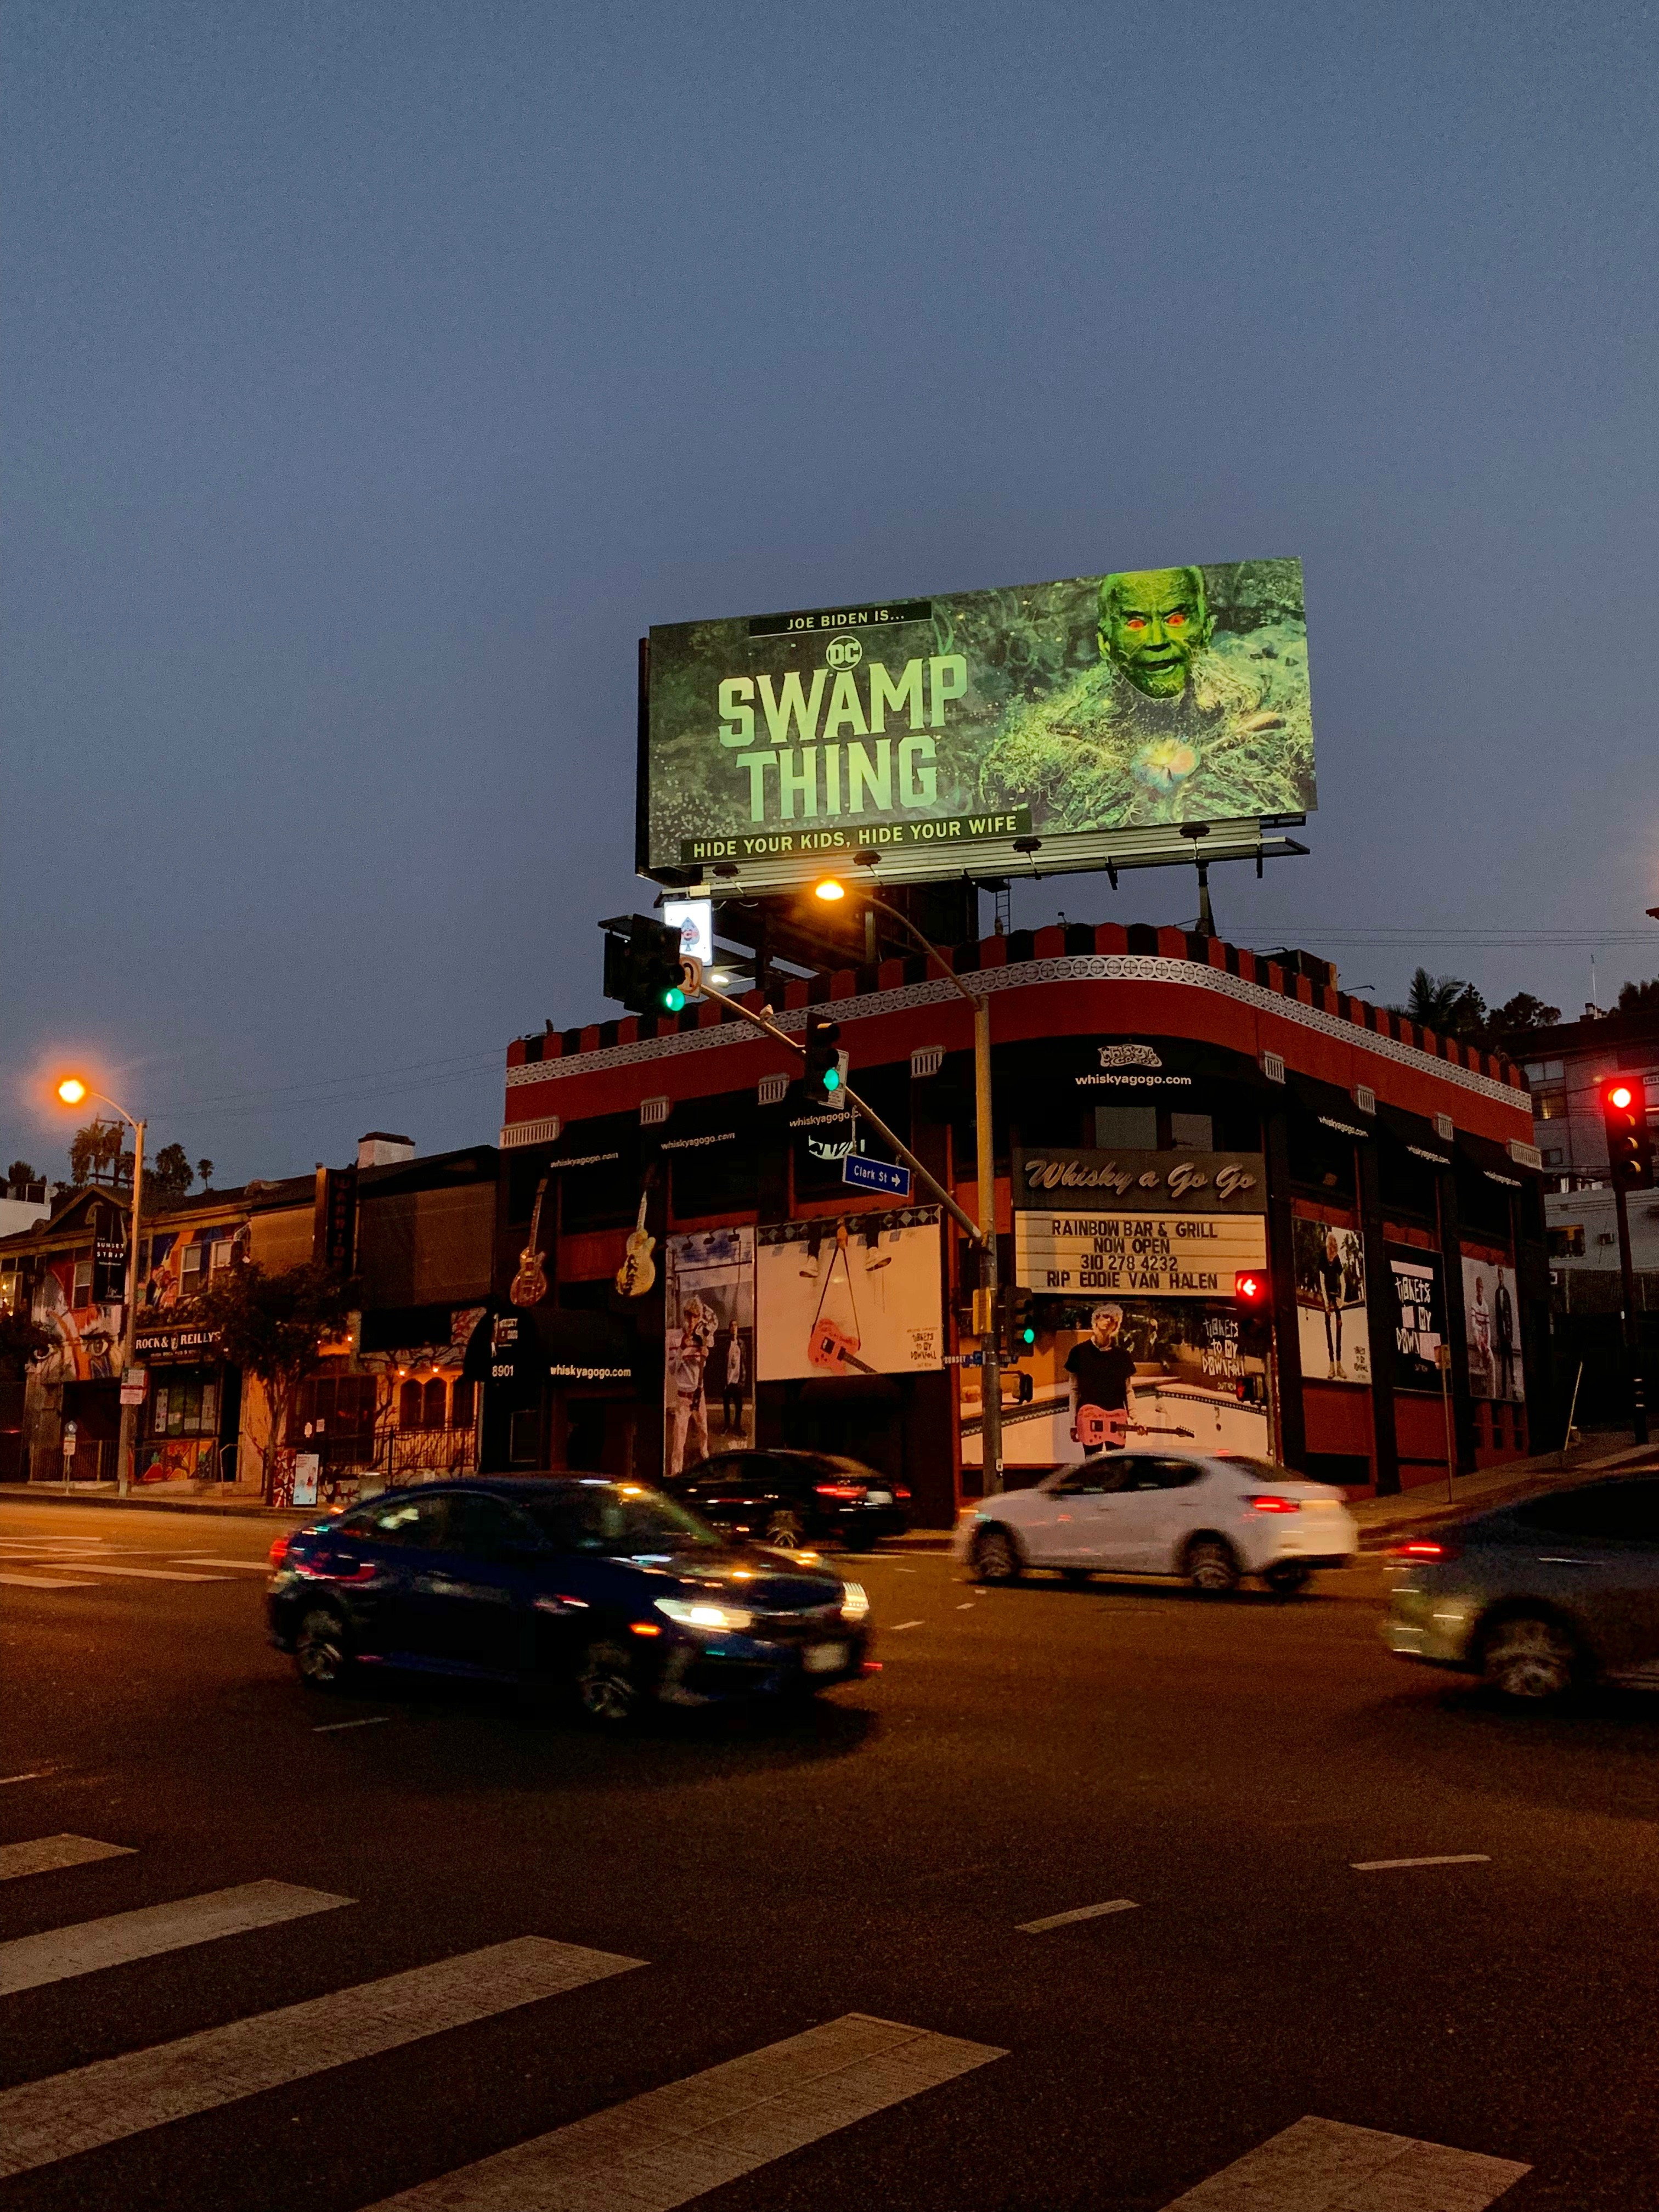 "Joe Biden is ""Swamp Thing"" on giant billboard on the Sunset Strip"